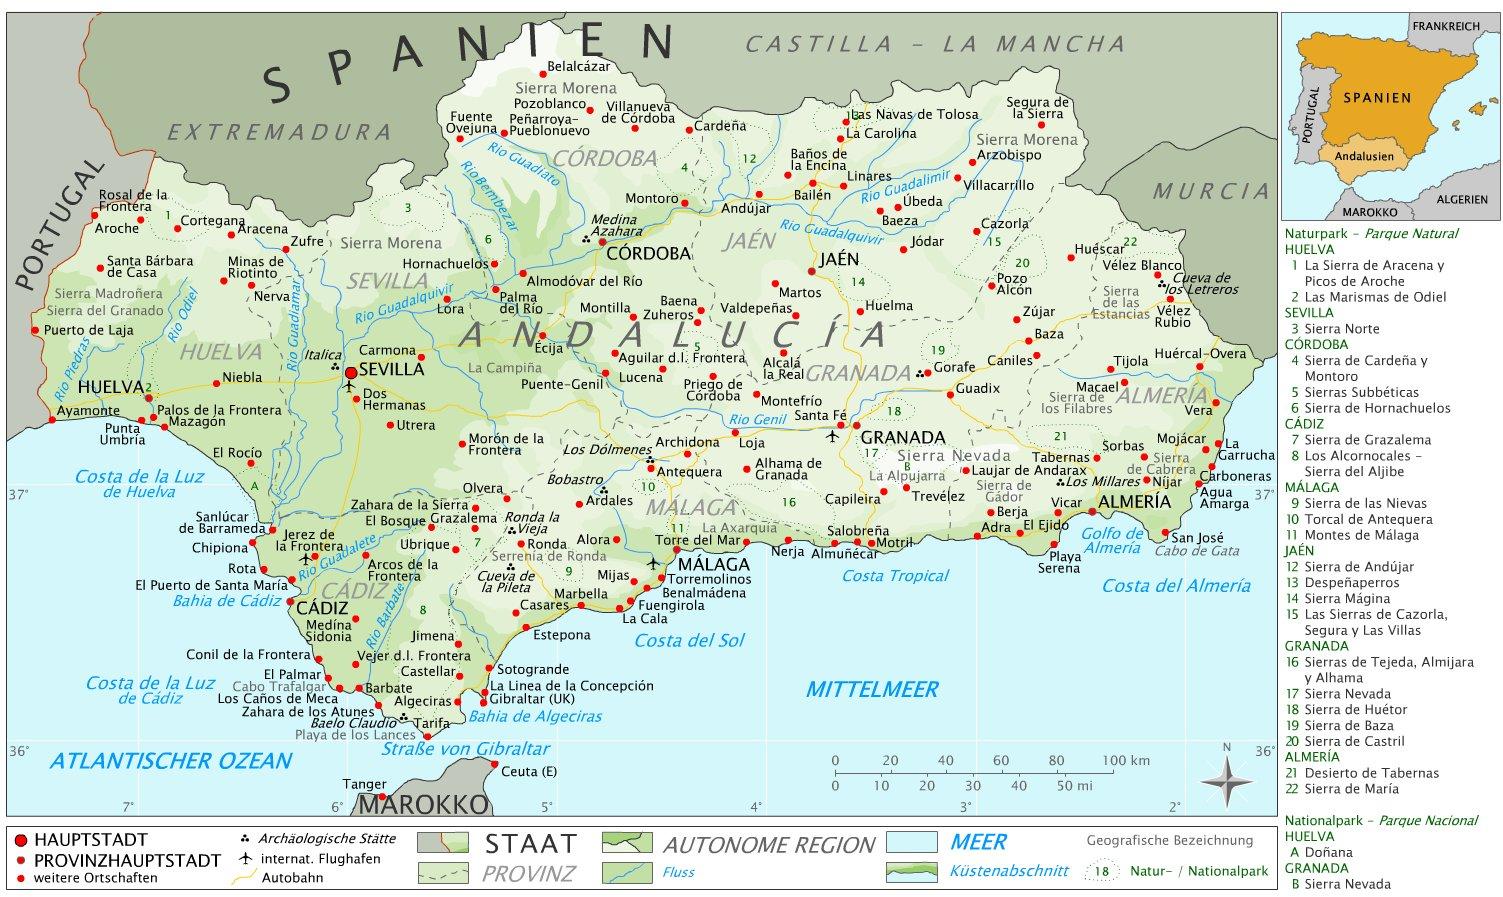 Карта Андалусии